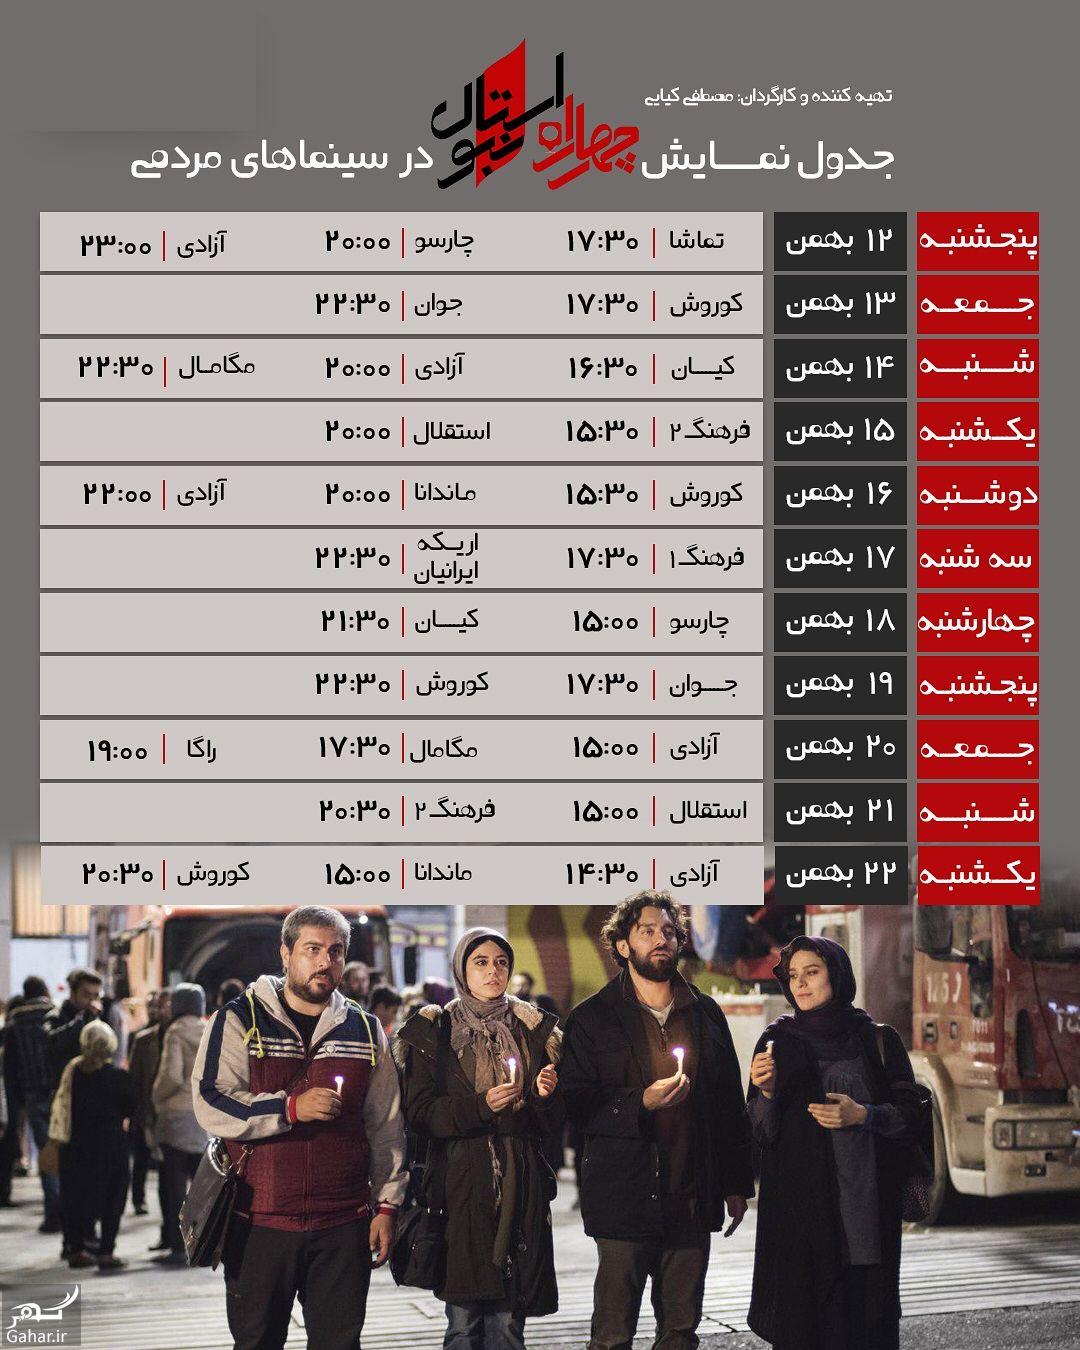 120142 Gahar ir برنامه نمایش فیلم چهار راه استانبول در سینماهای مردمی